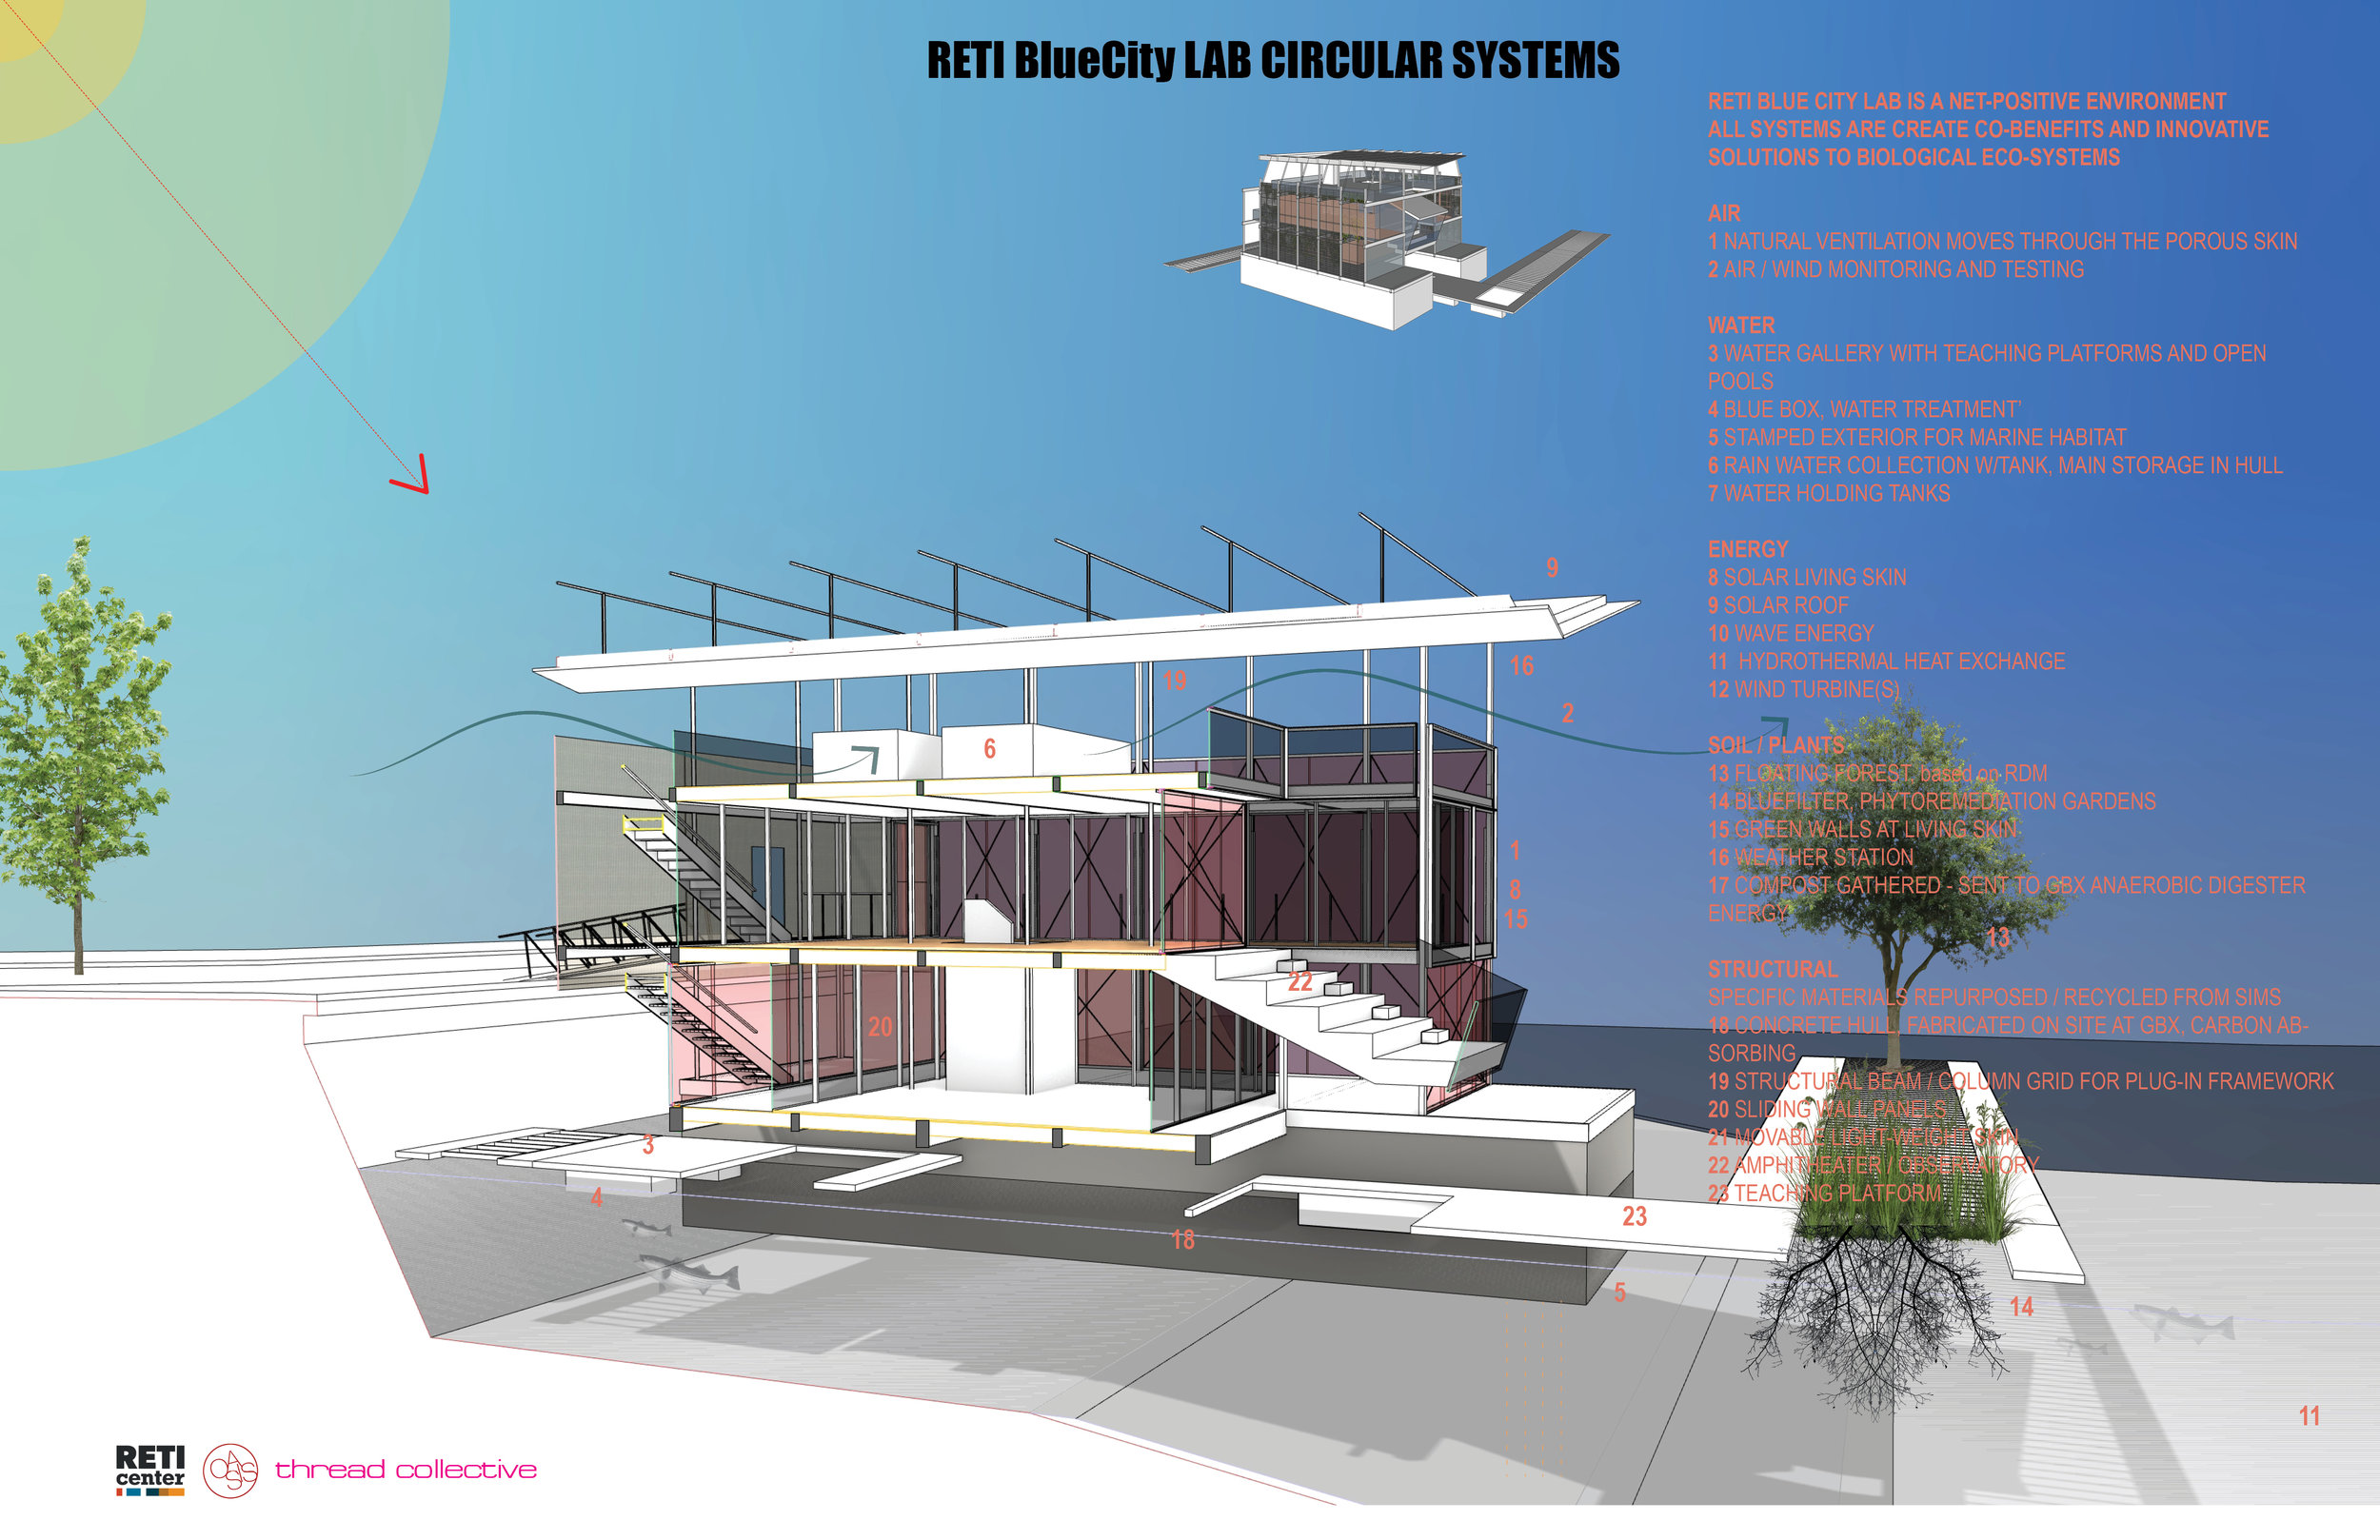 060119 RETI BlueCity LAB design crit presentation6.jpg